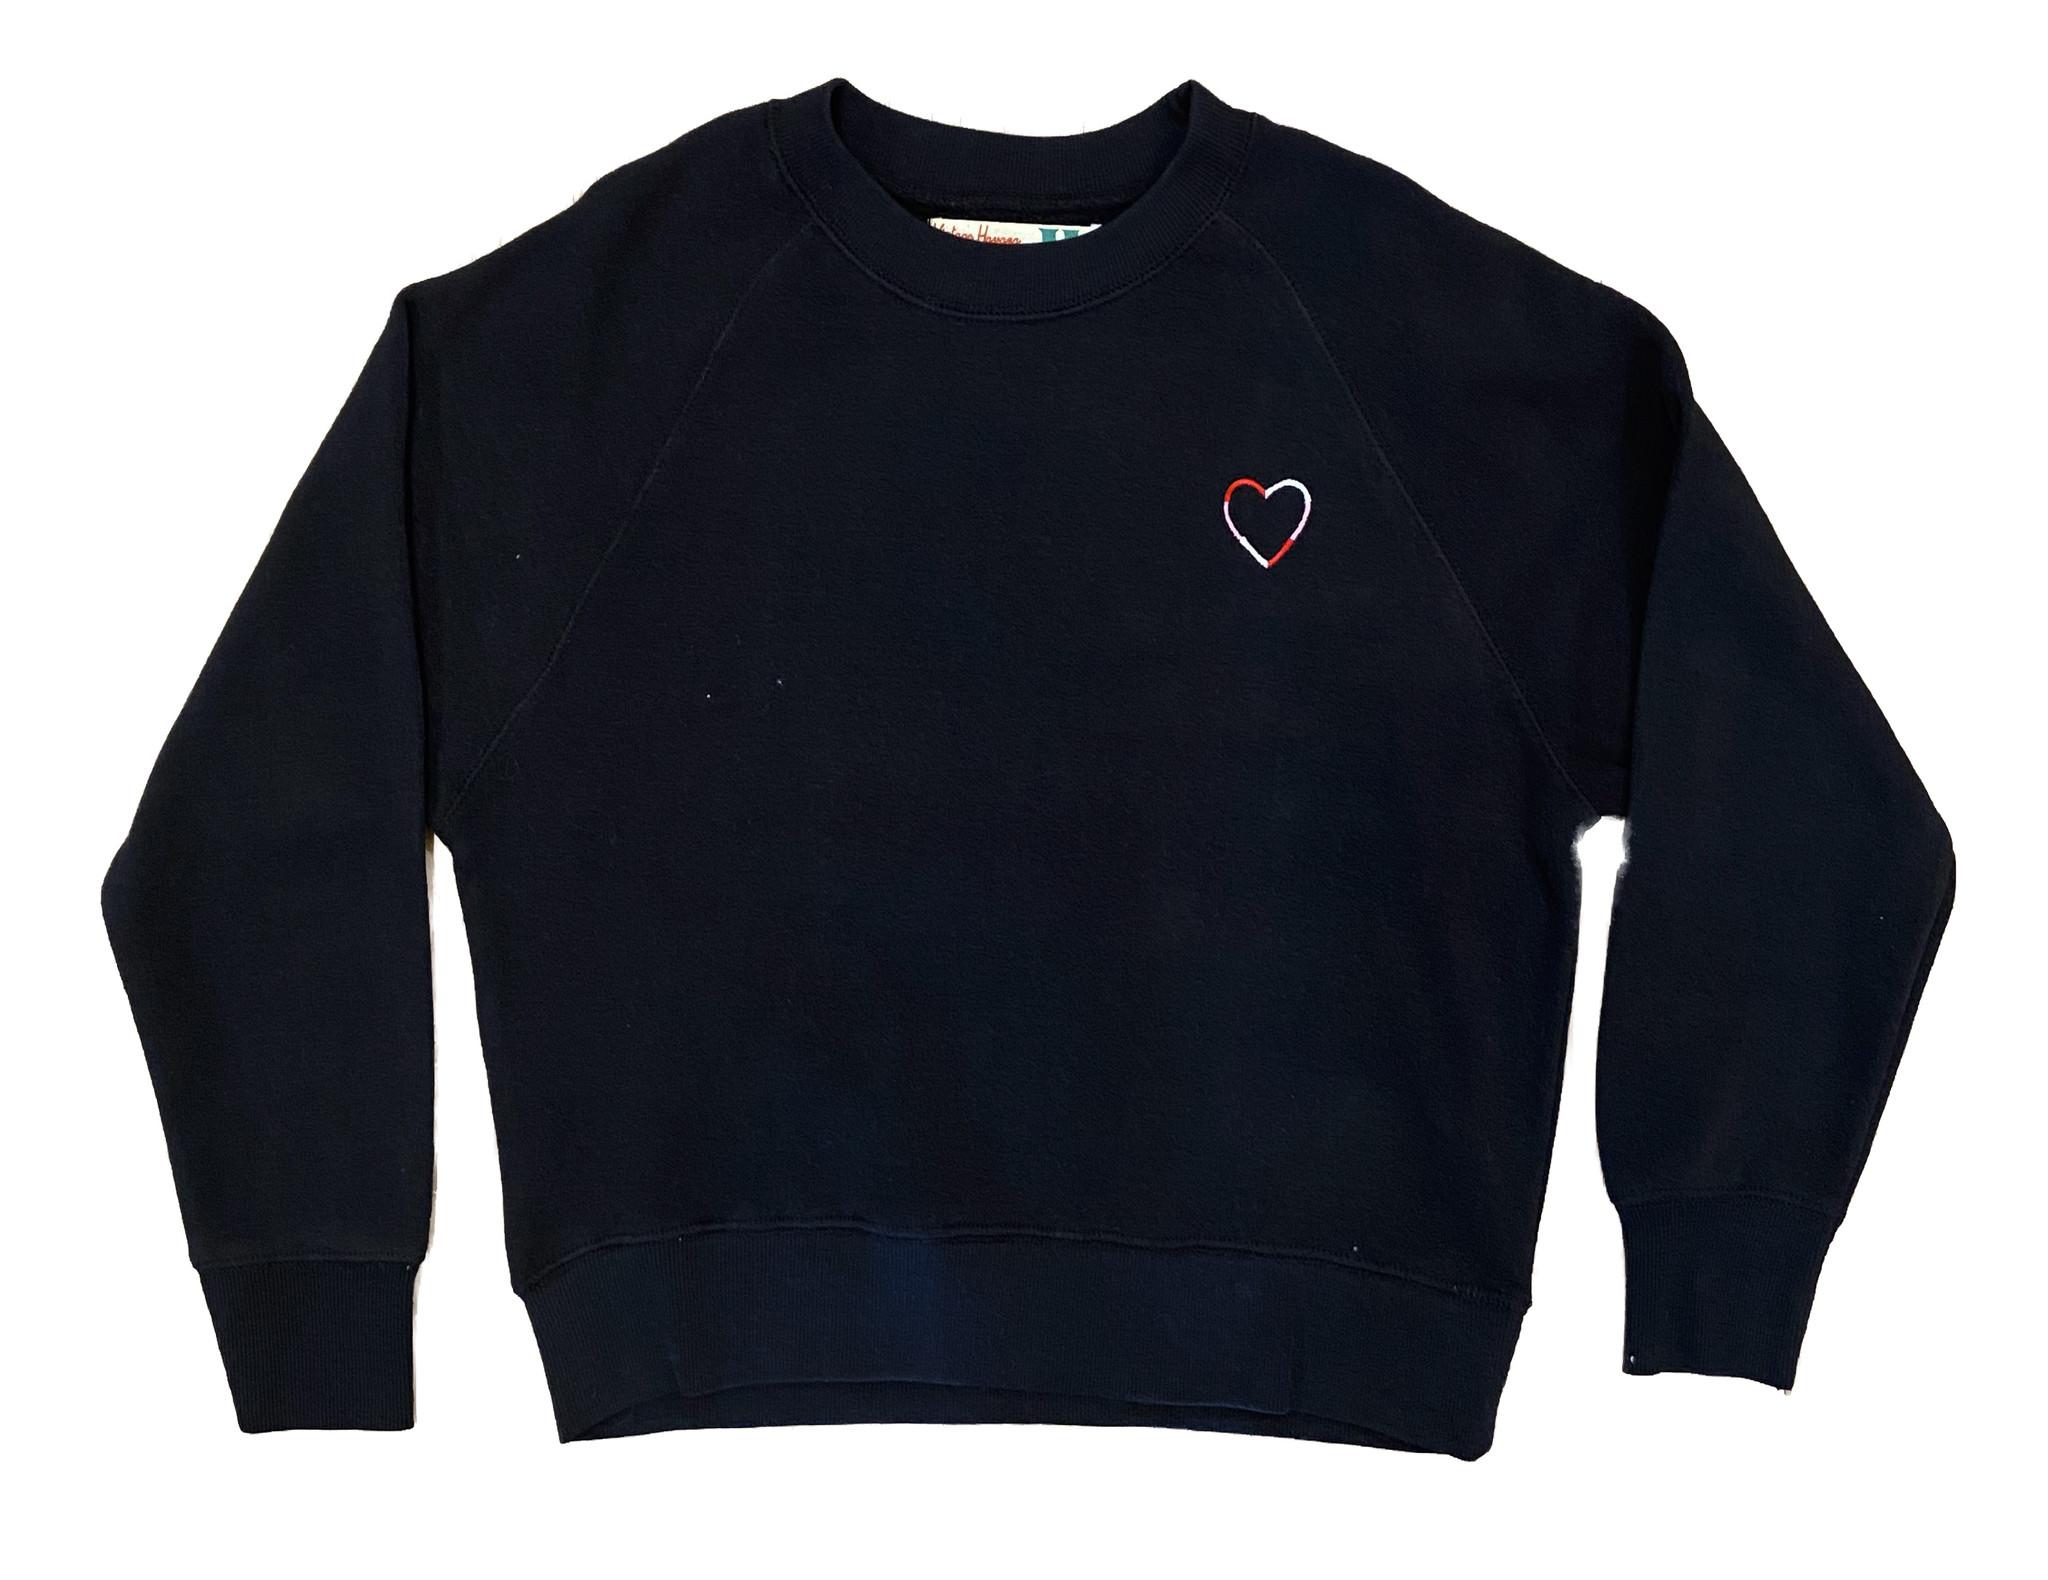 Vintage Havana Black Sweatshirt with Heart